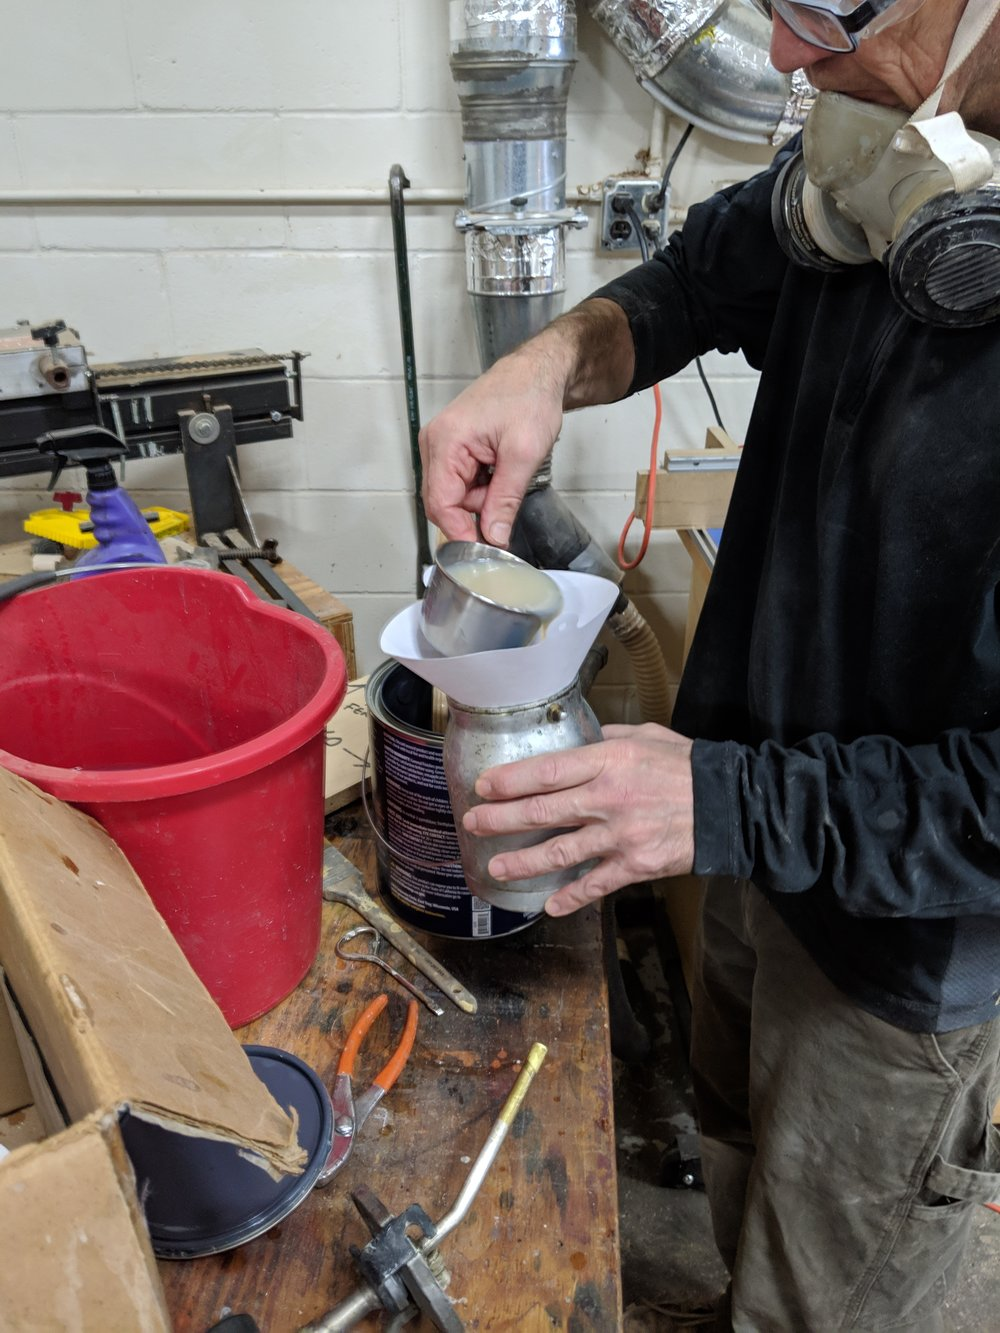 Filling up the spray gun